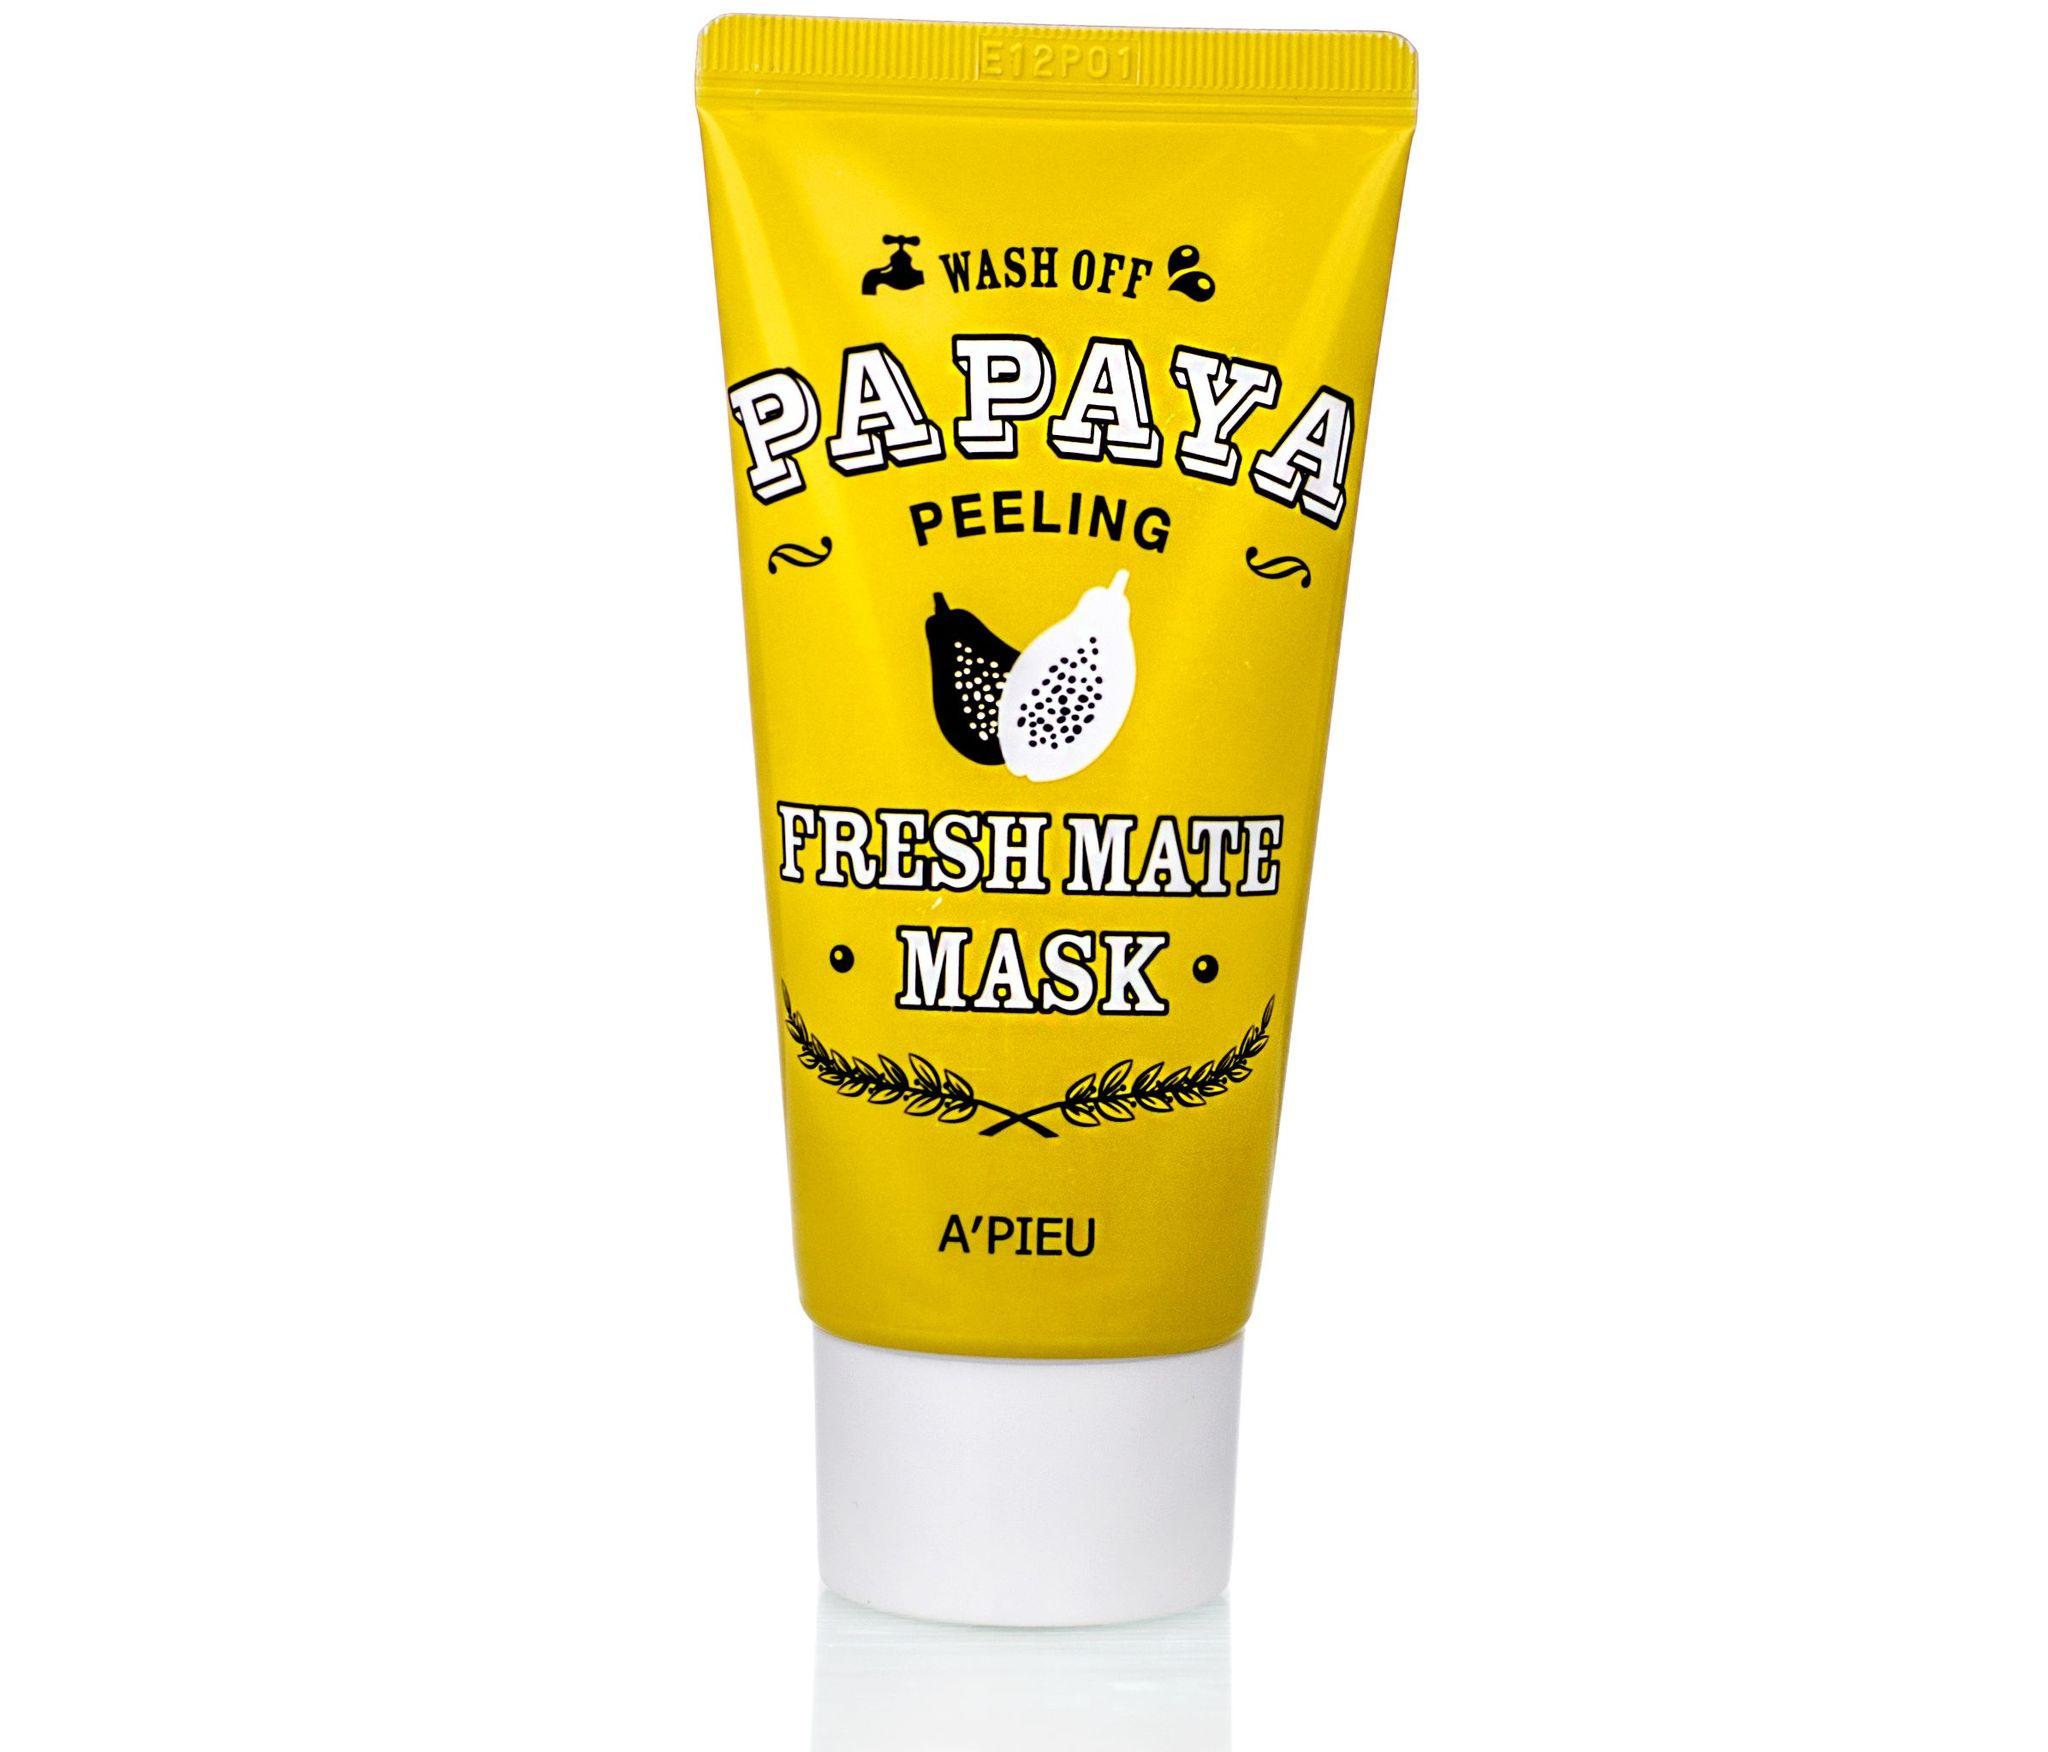 Очищающие Маска для лица A'PIEU очищающая для лица с папайей Fresh Mate Papaya Mask (Peeling) 50 мл 600000139754b0.jpeg